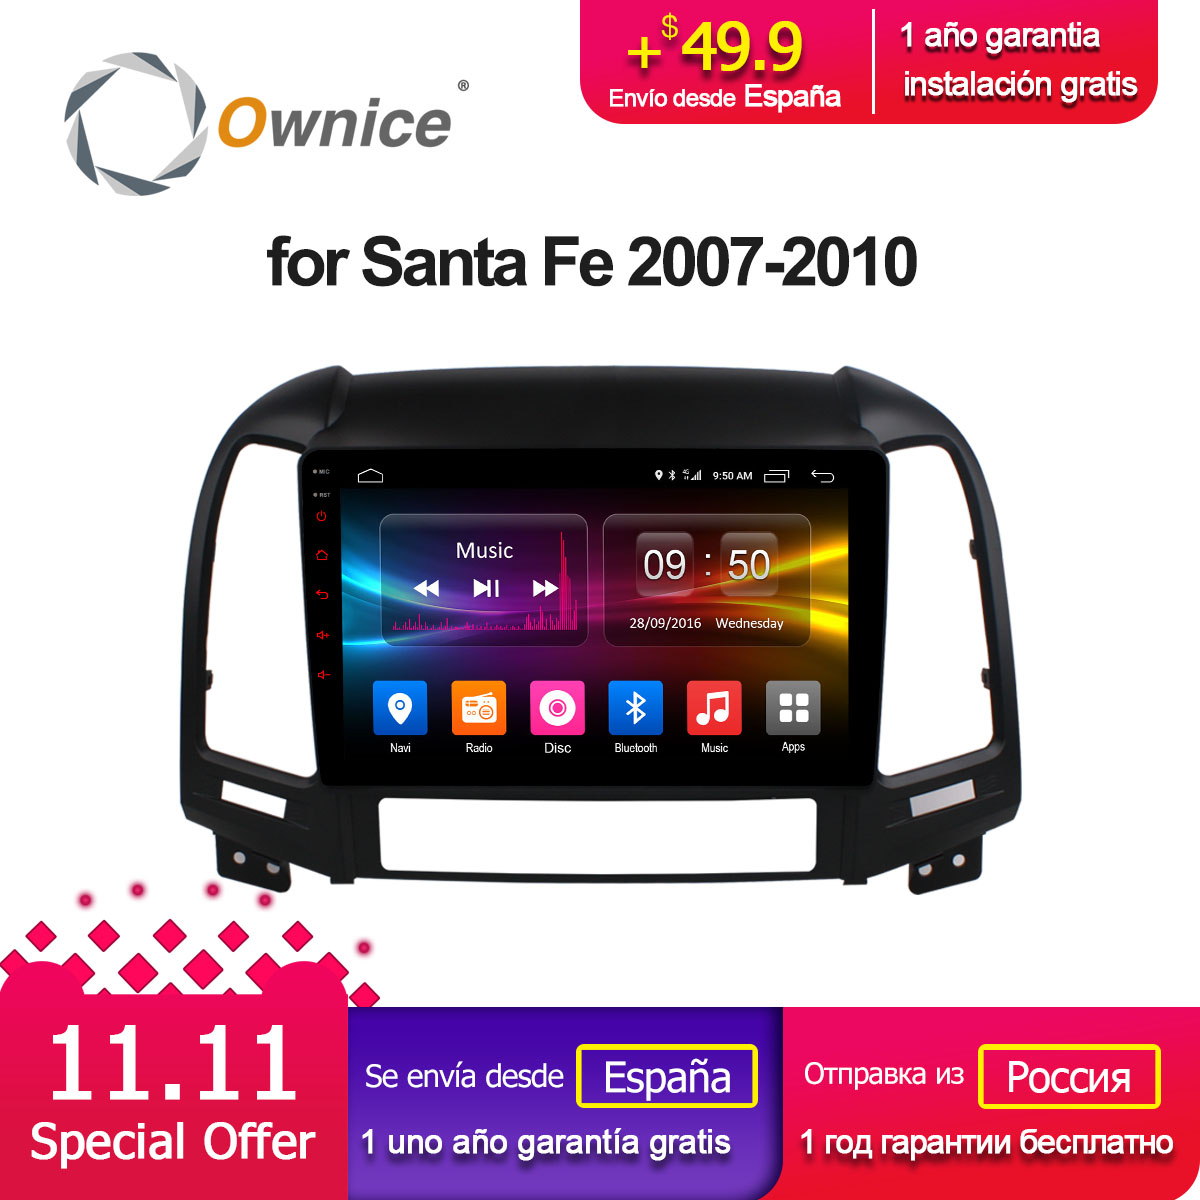 Ownice C500 + G10 Android 8.1 Octa base pour Hyundai Santa Fe 2007-2010 Voiture DVD gps raido audio navi lecteur 32g ROM 2g RAM 4g SIM